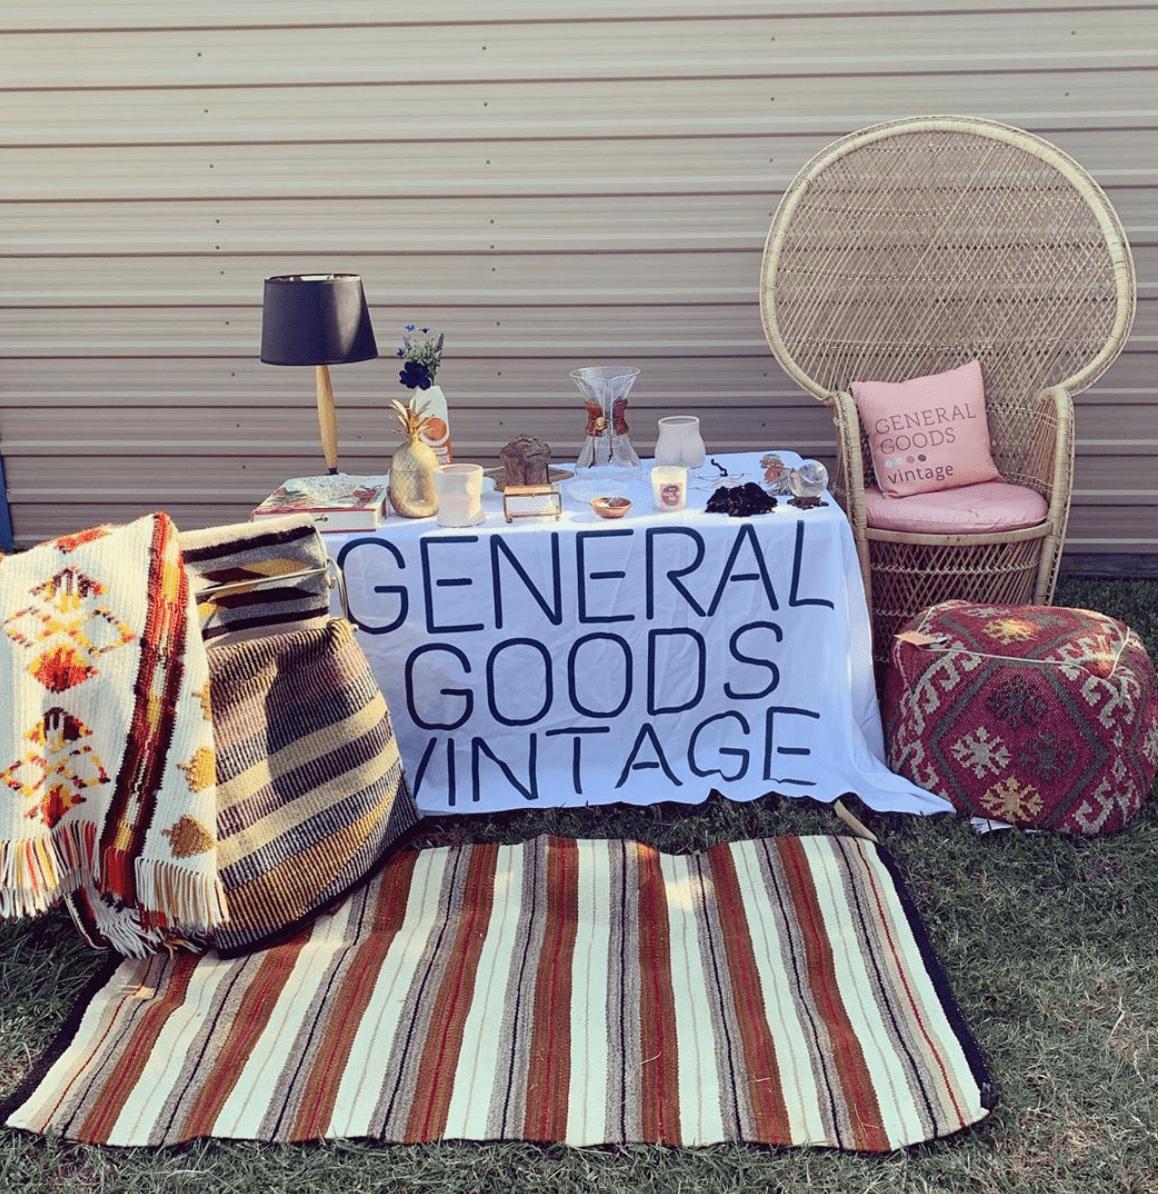 General Goods Vintage Corpus Christi